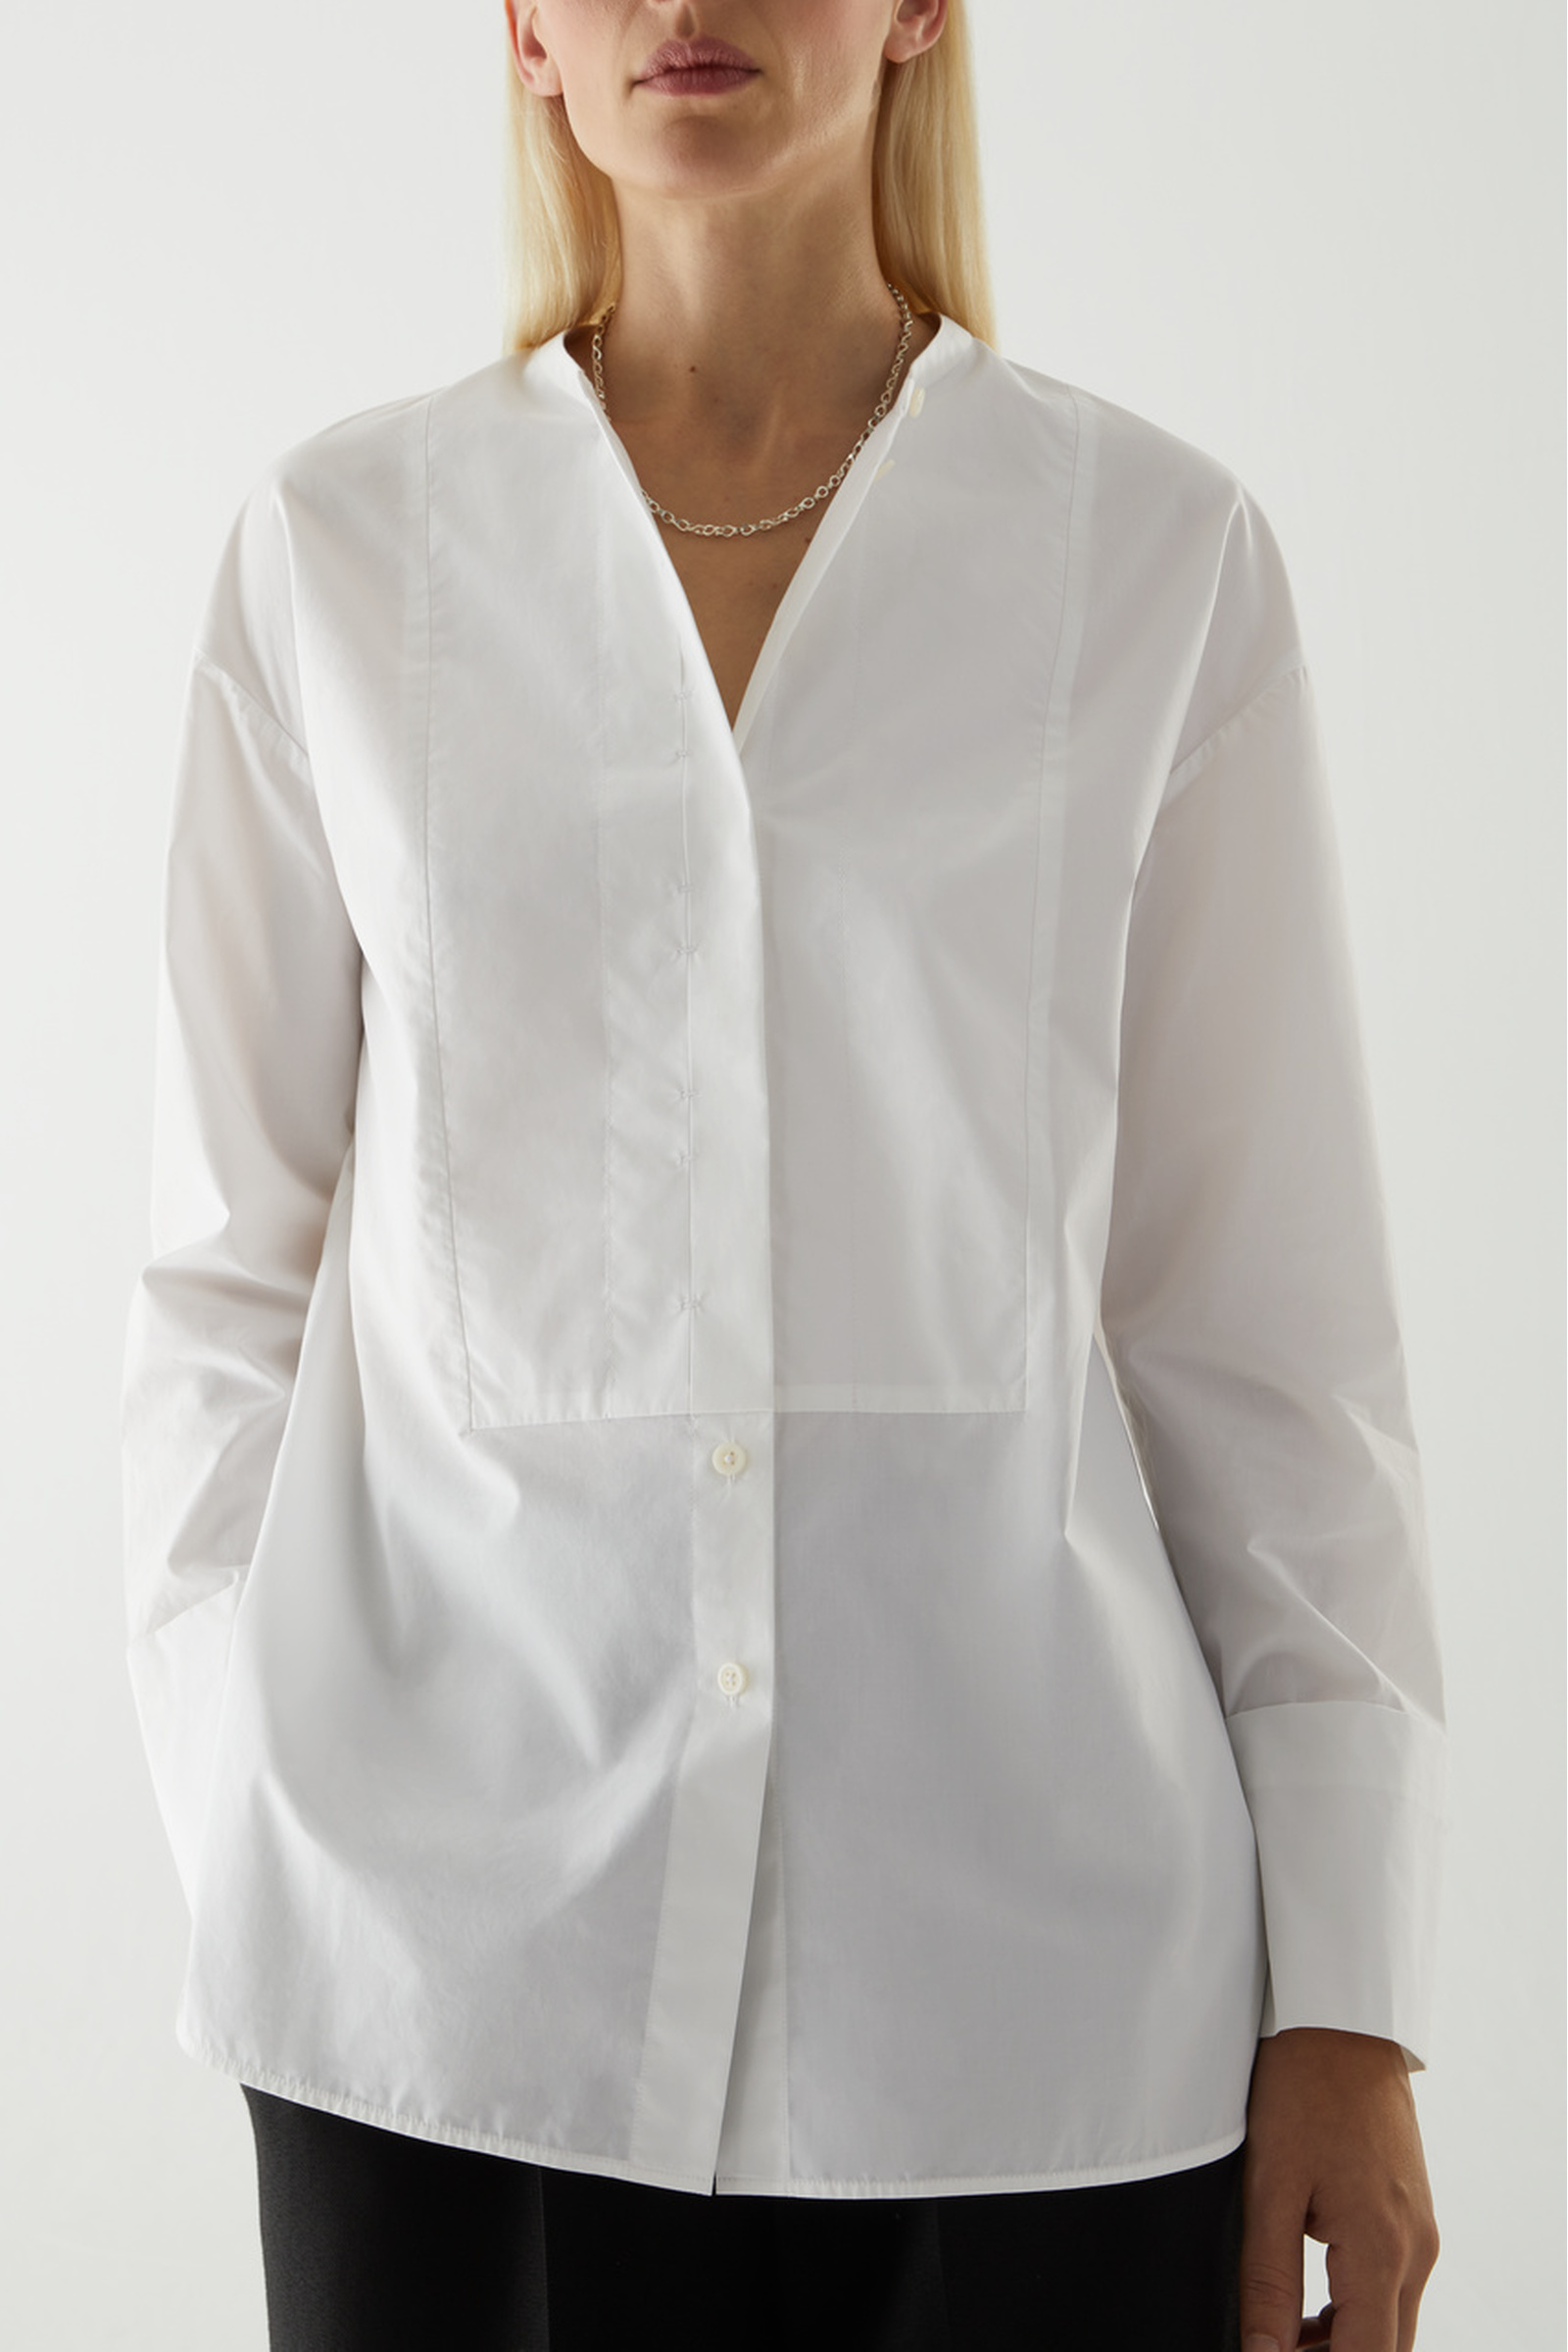 COS 코튼 빕 인서트 튜닉 스타일 셔츠의 화이트컬러 ECOMLook입니다.